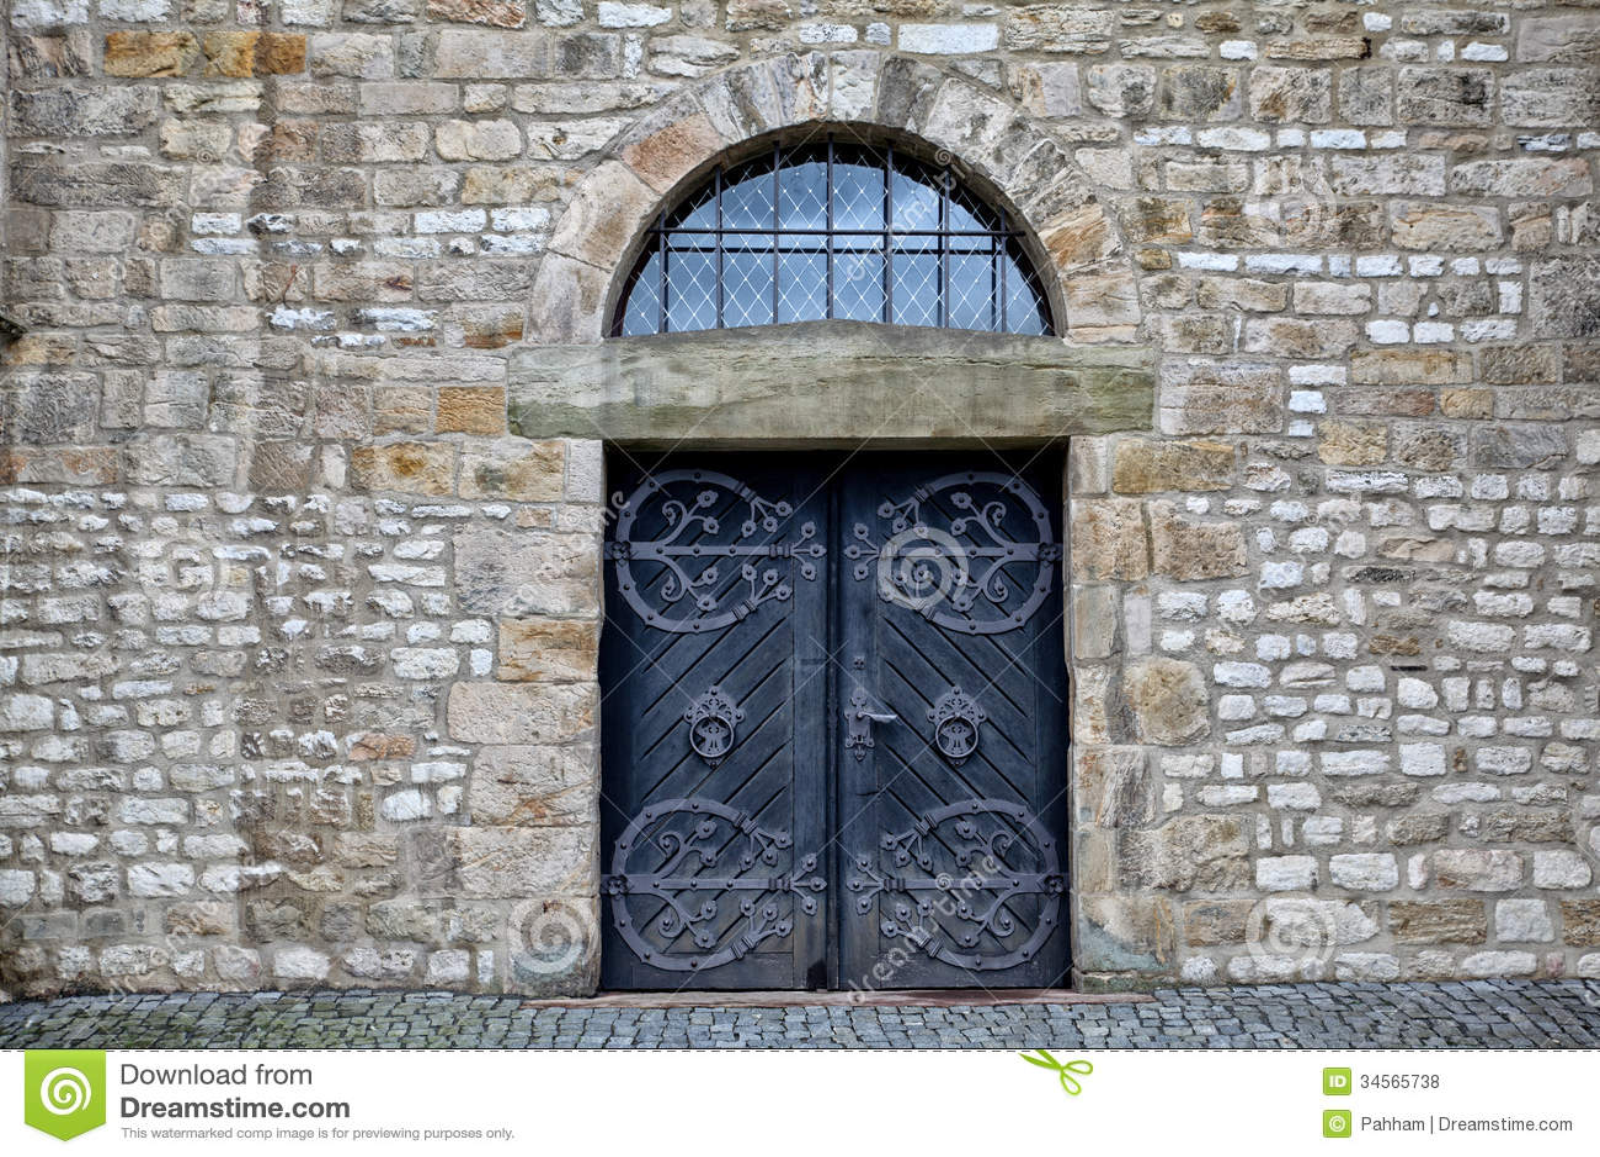 Royalty-Free Stock Photo & Wooden Door Royalty Free Stock Photos - Image: 34565738 Pezcame.Com